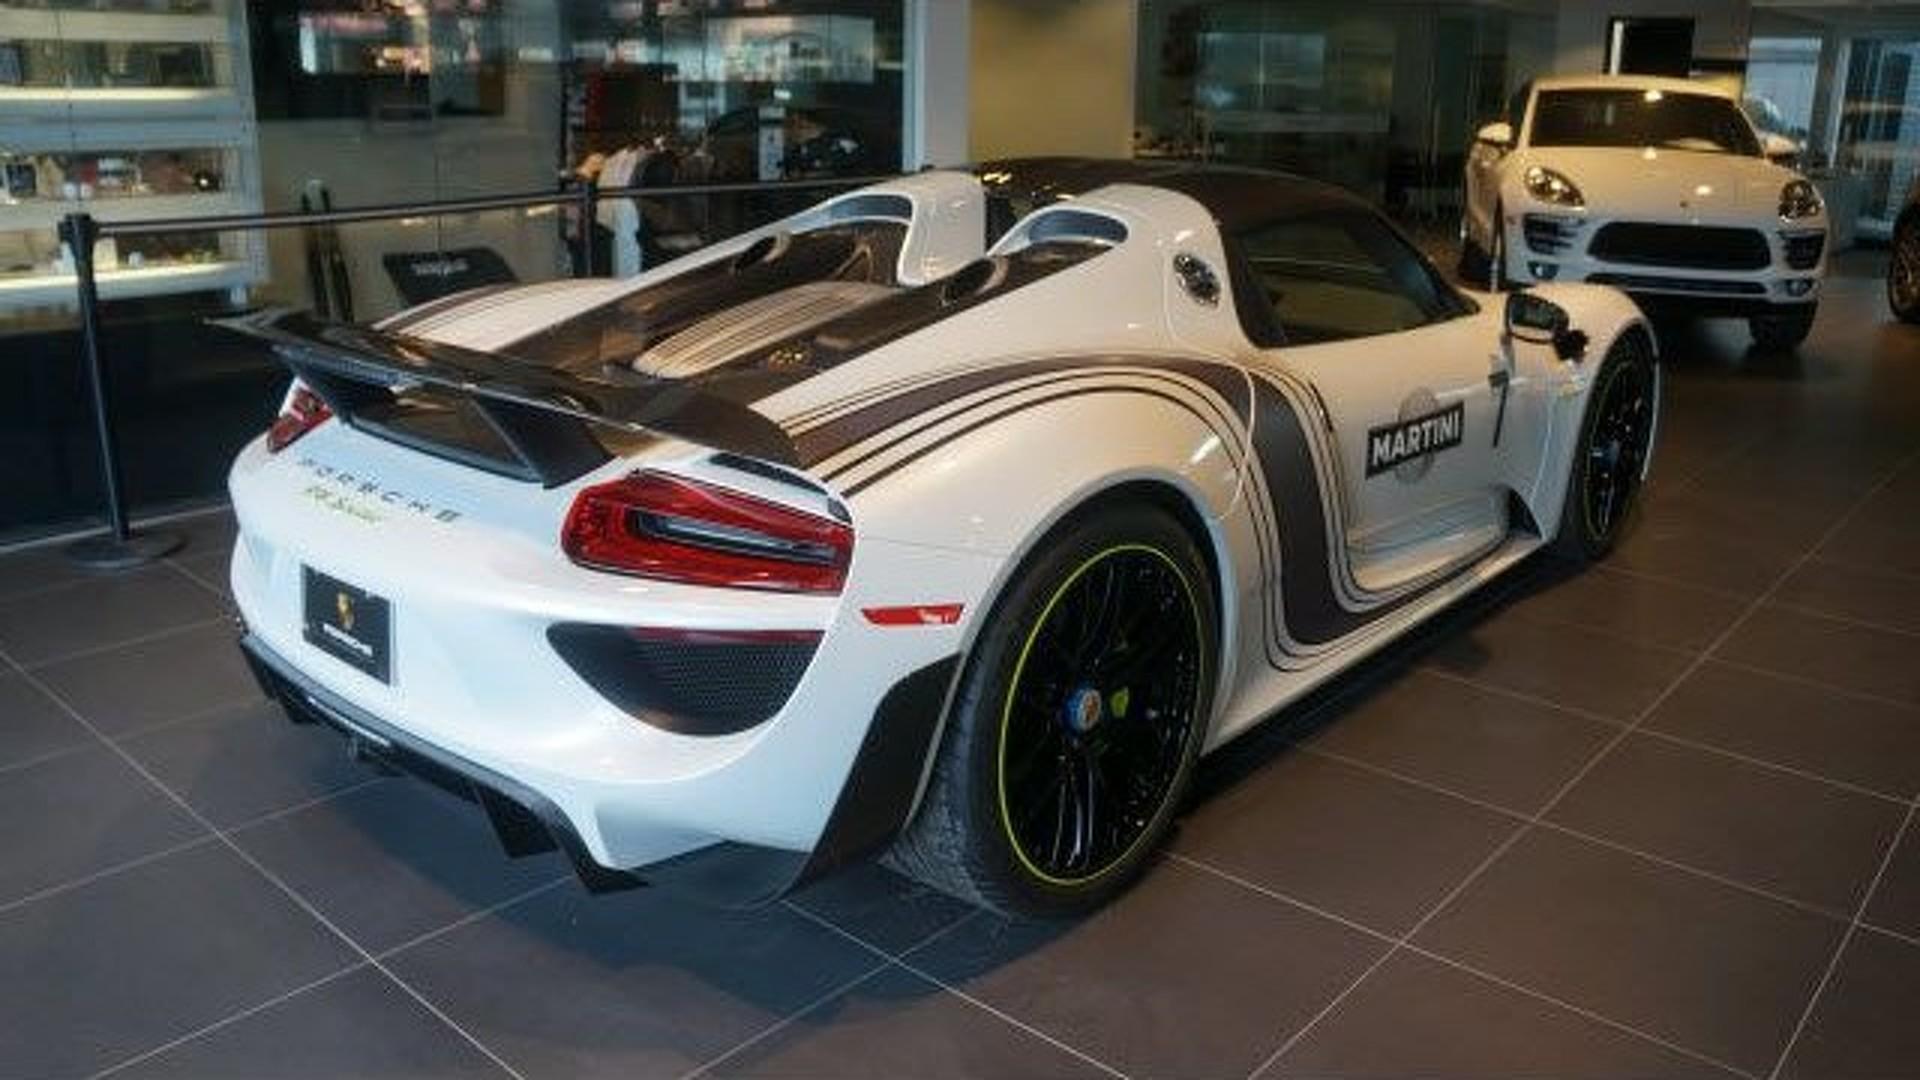 2015-porsche-918-spyder-weissach-package Remarkable Porsche 918 Spyder In London Cars Trend